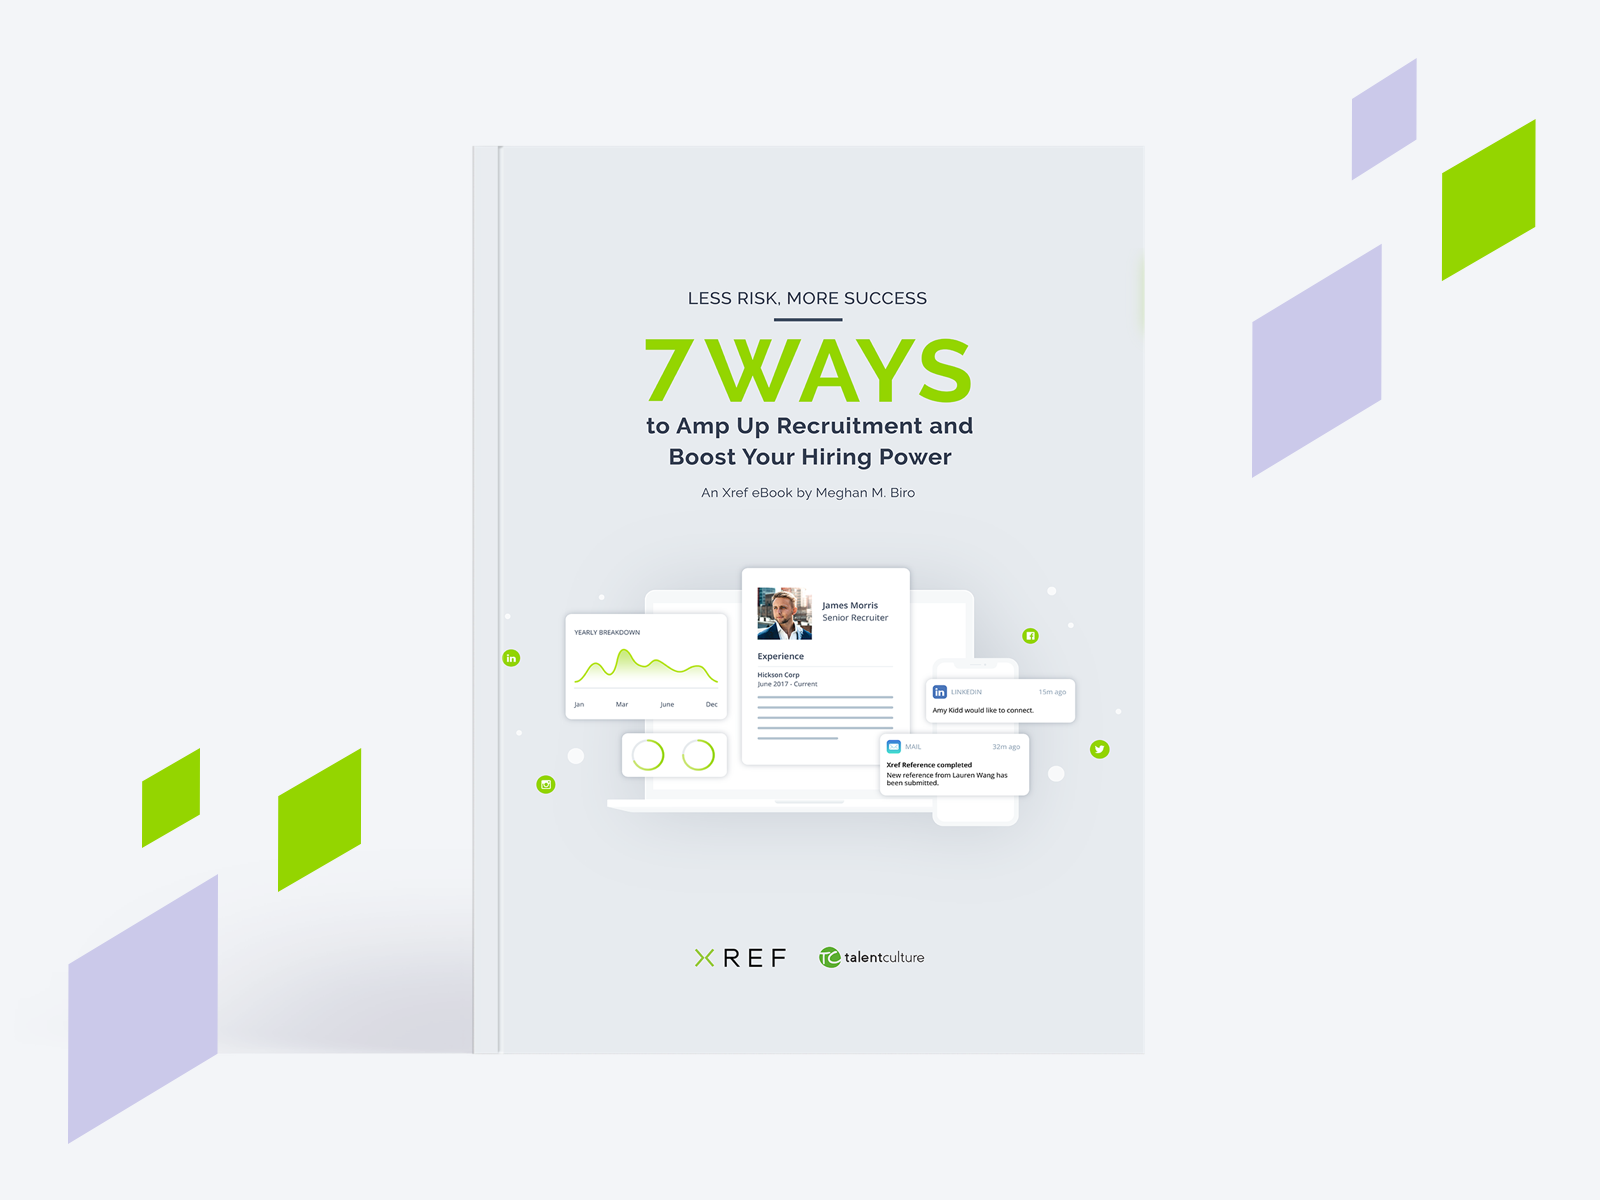 7 ways ebook on grey background